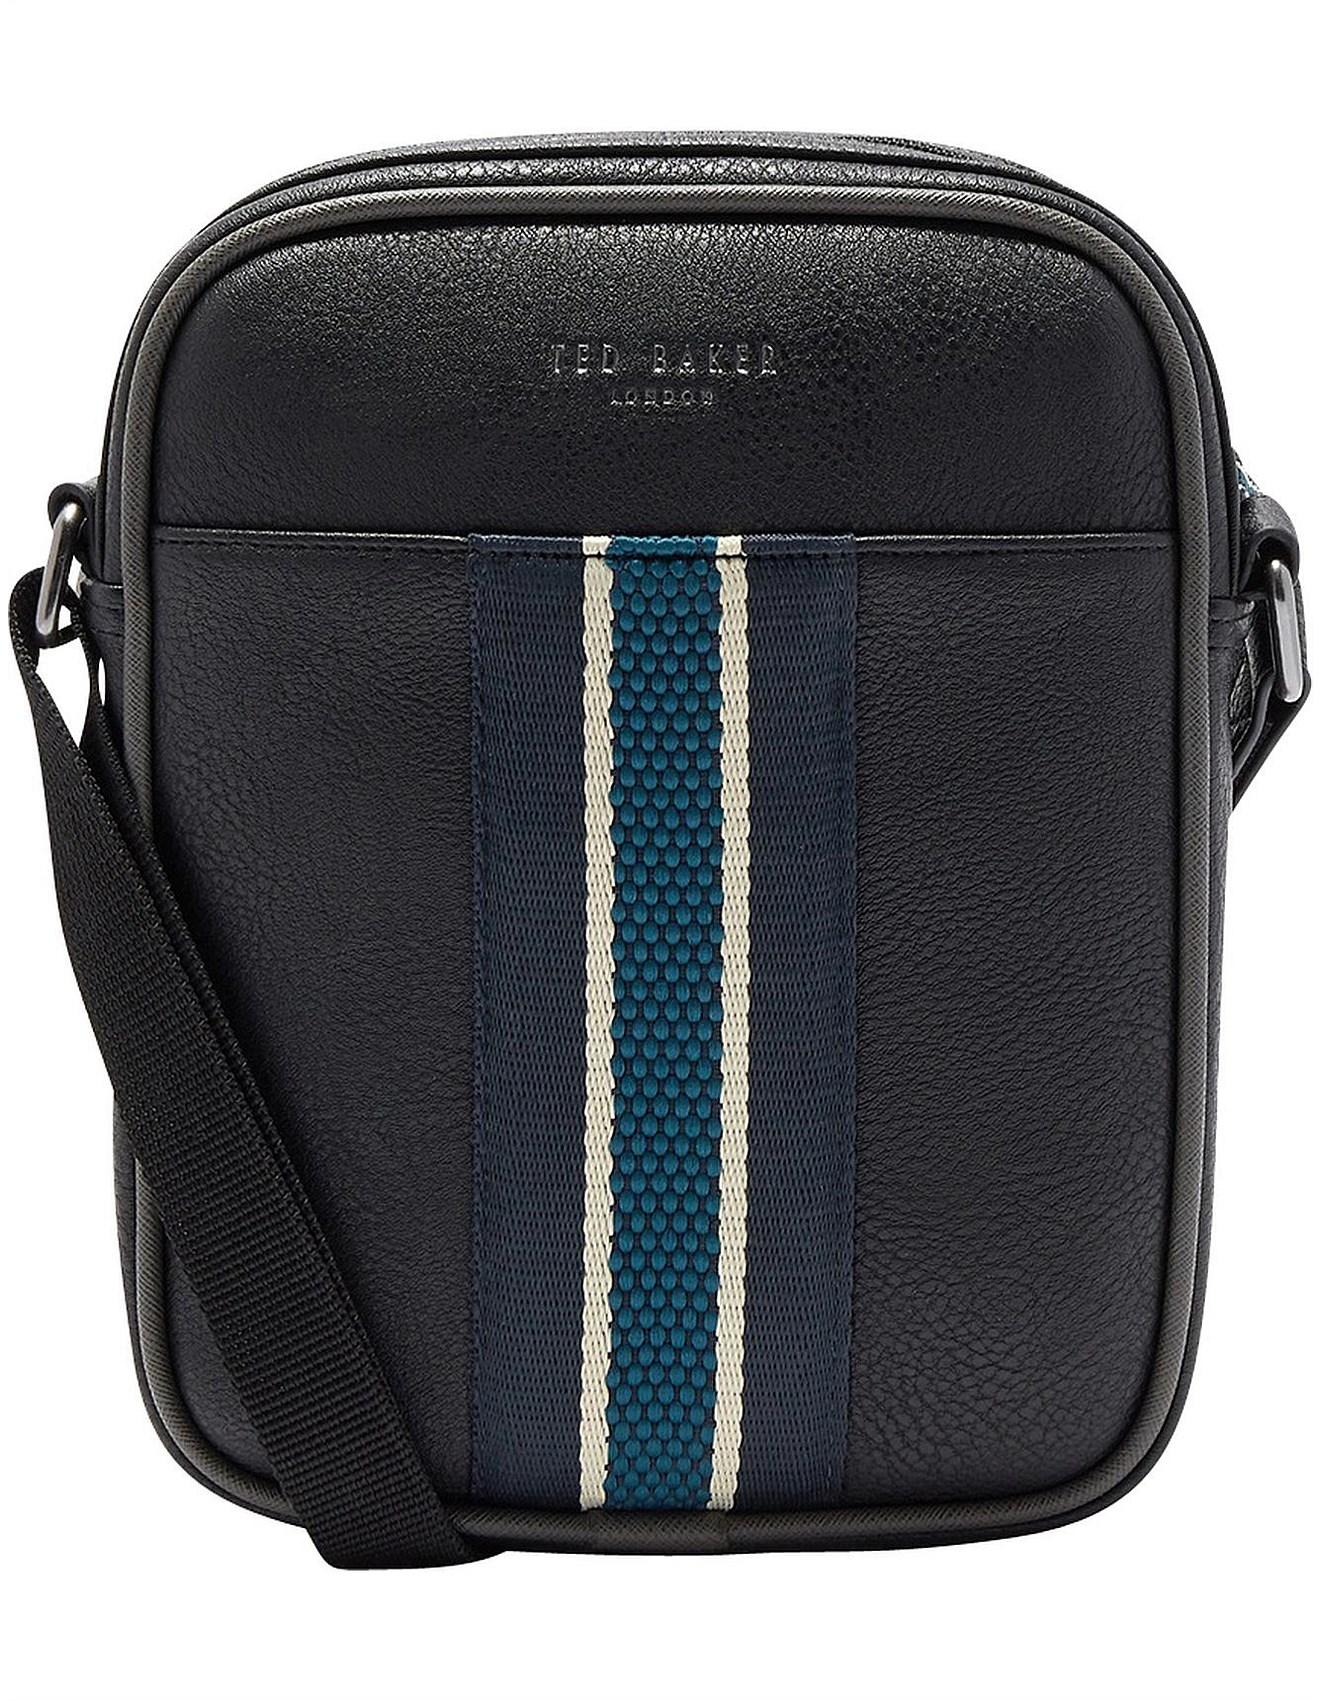 5faa335360fb Luggage & Travel Bags   Buy Luggage Online   David Jones - WEBBING FLIGHT  BAG